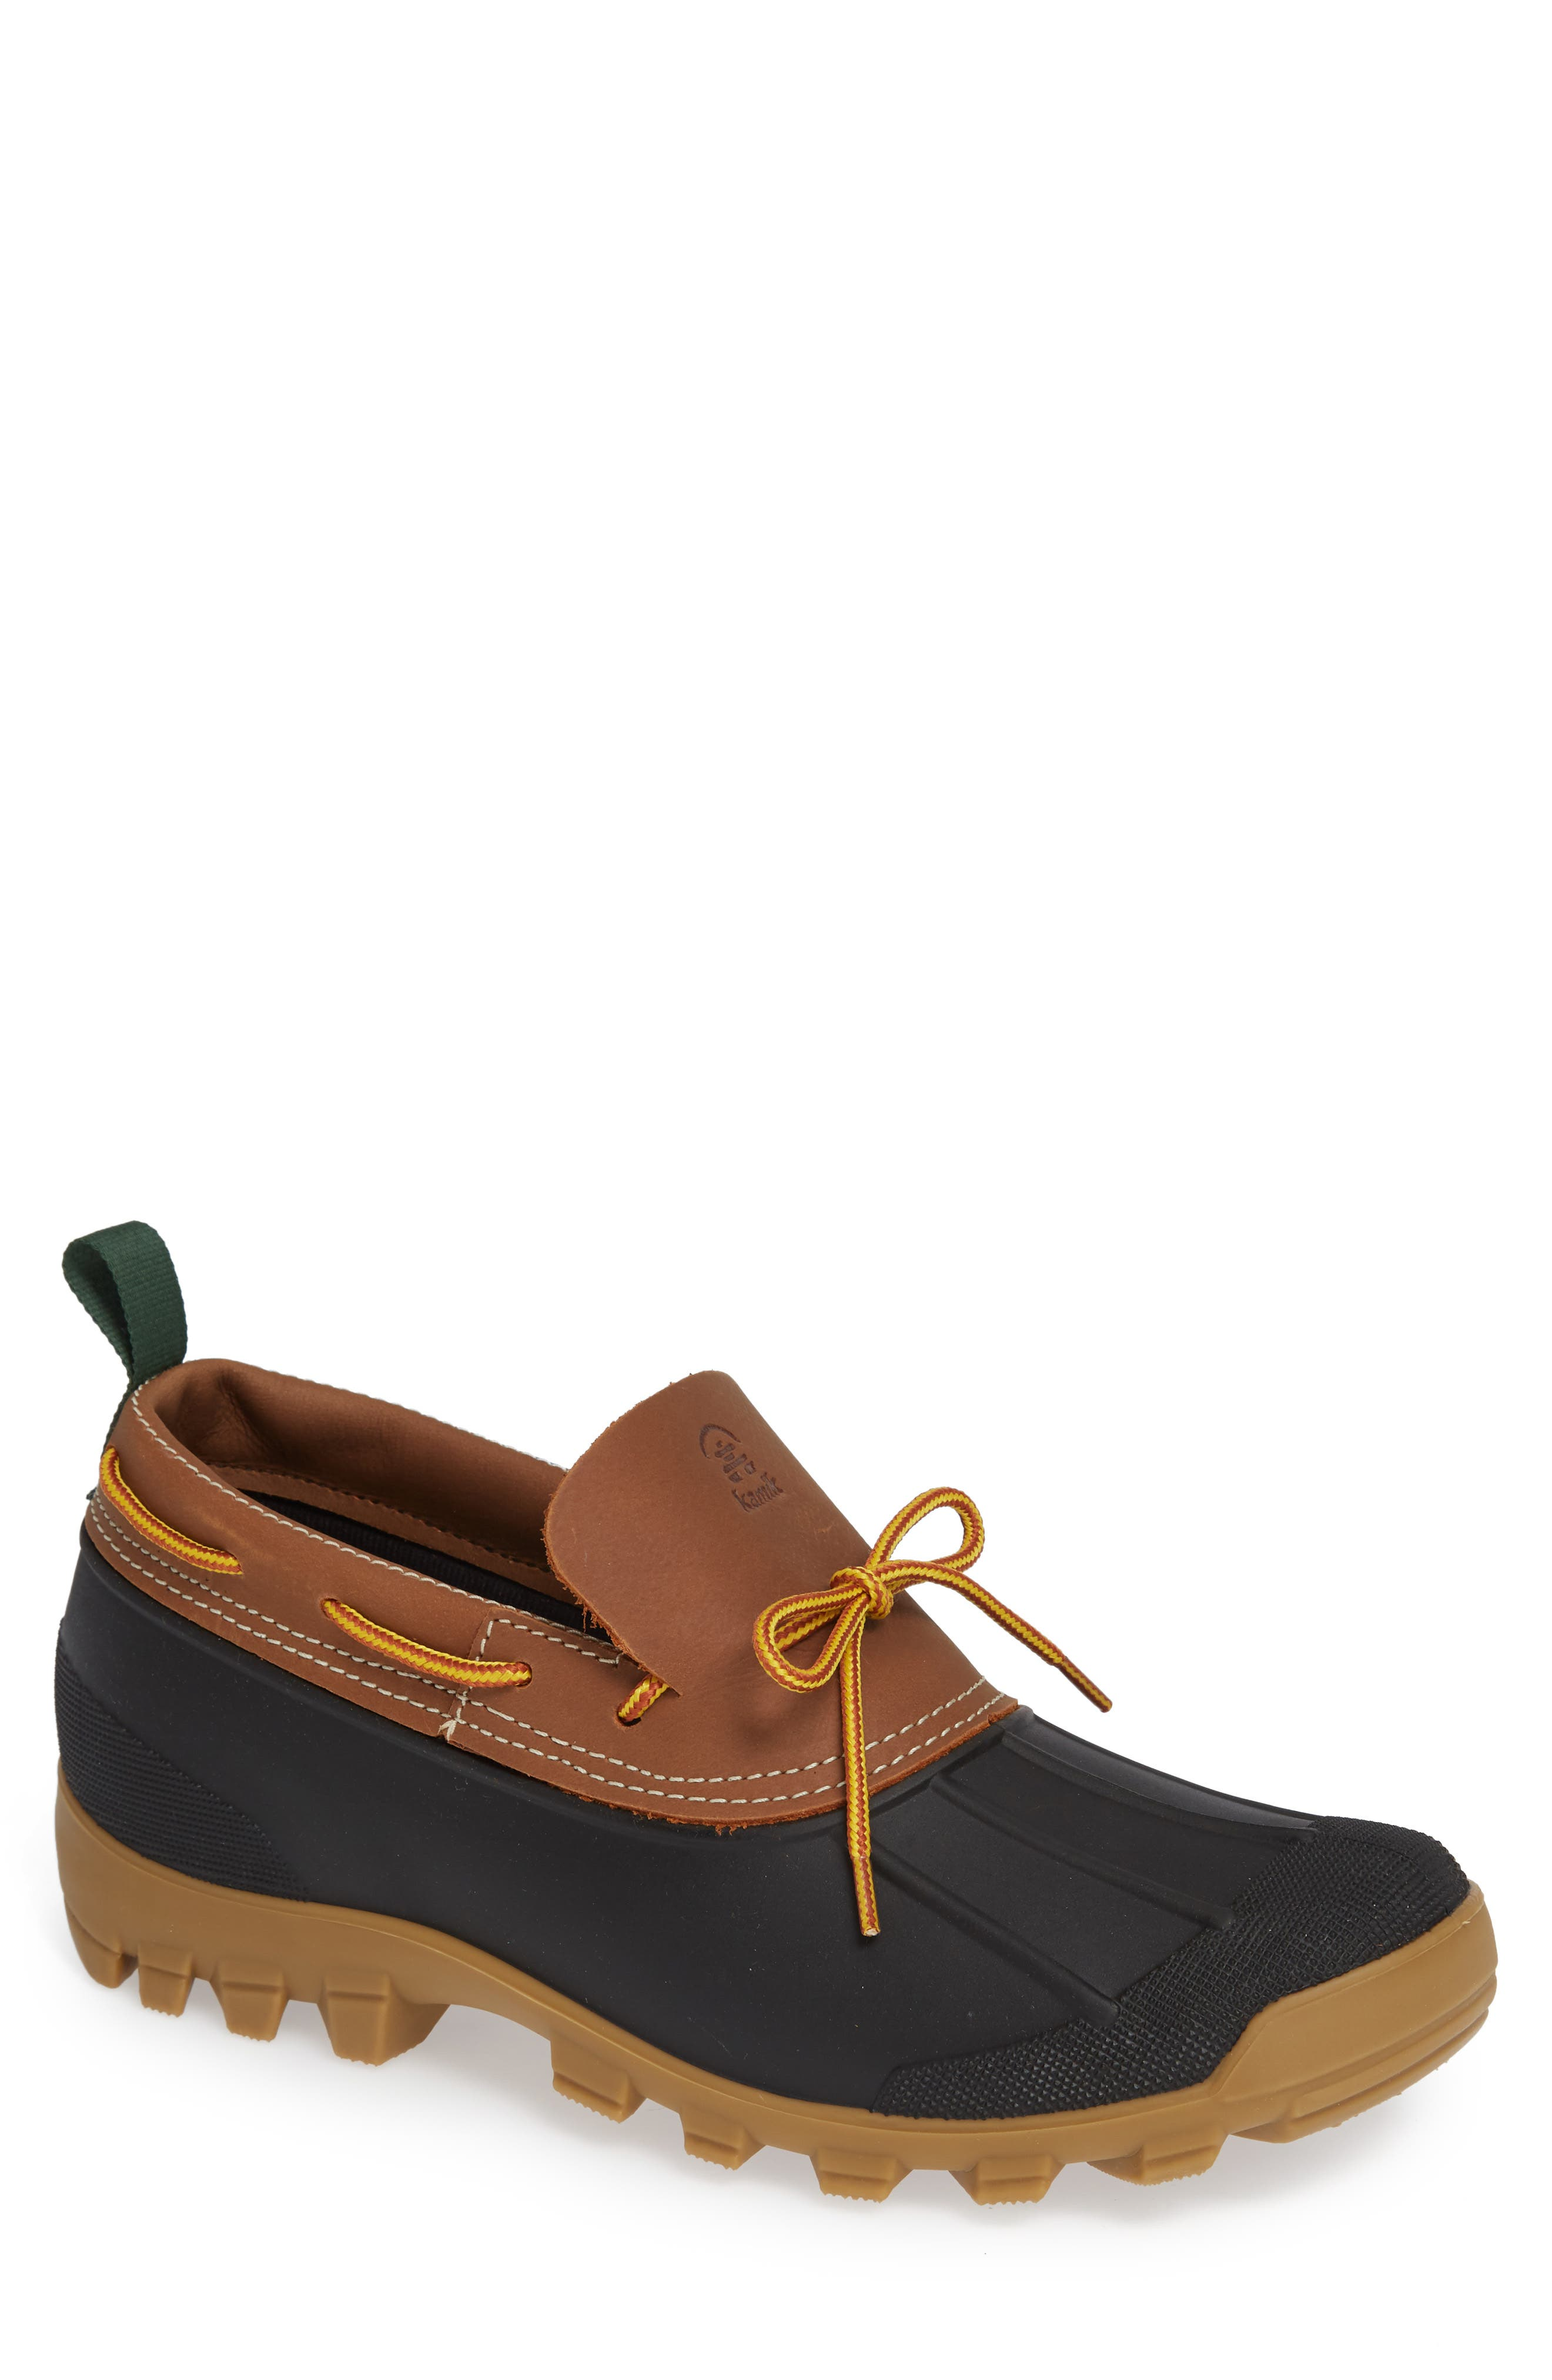 Yukon Short Waterproof Boot, Main, color, TAN LEATHER